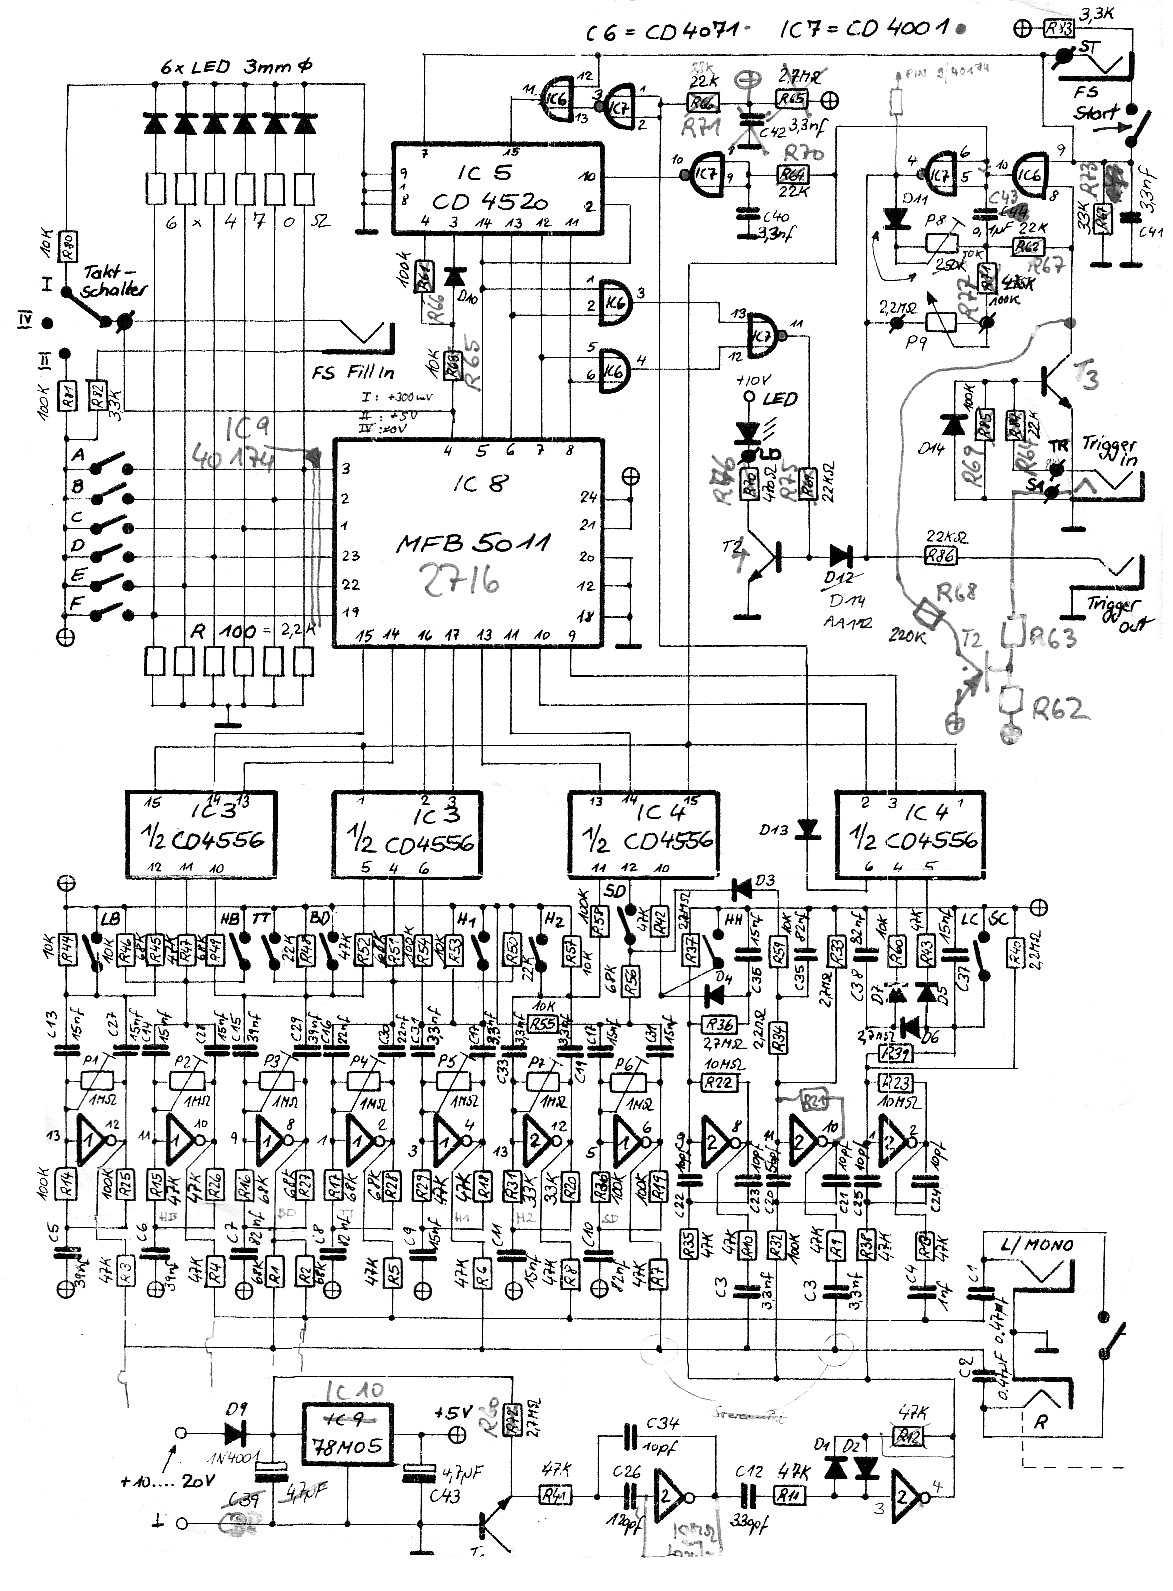 [DIAGRAM] Asv 100 Wiring Diagram